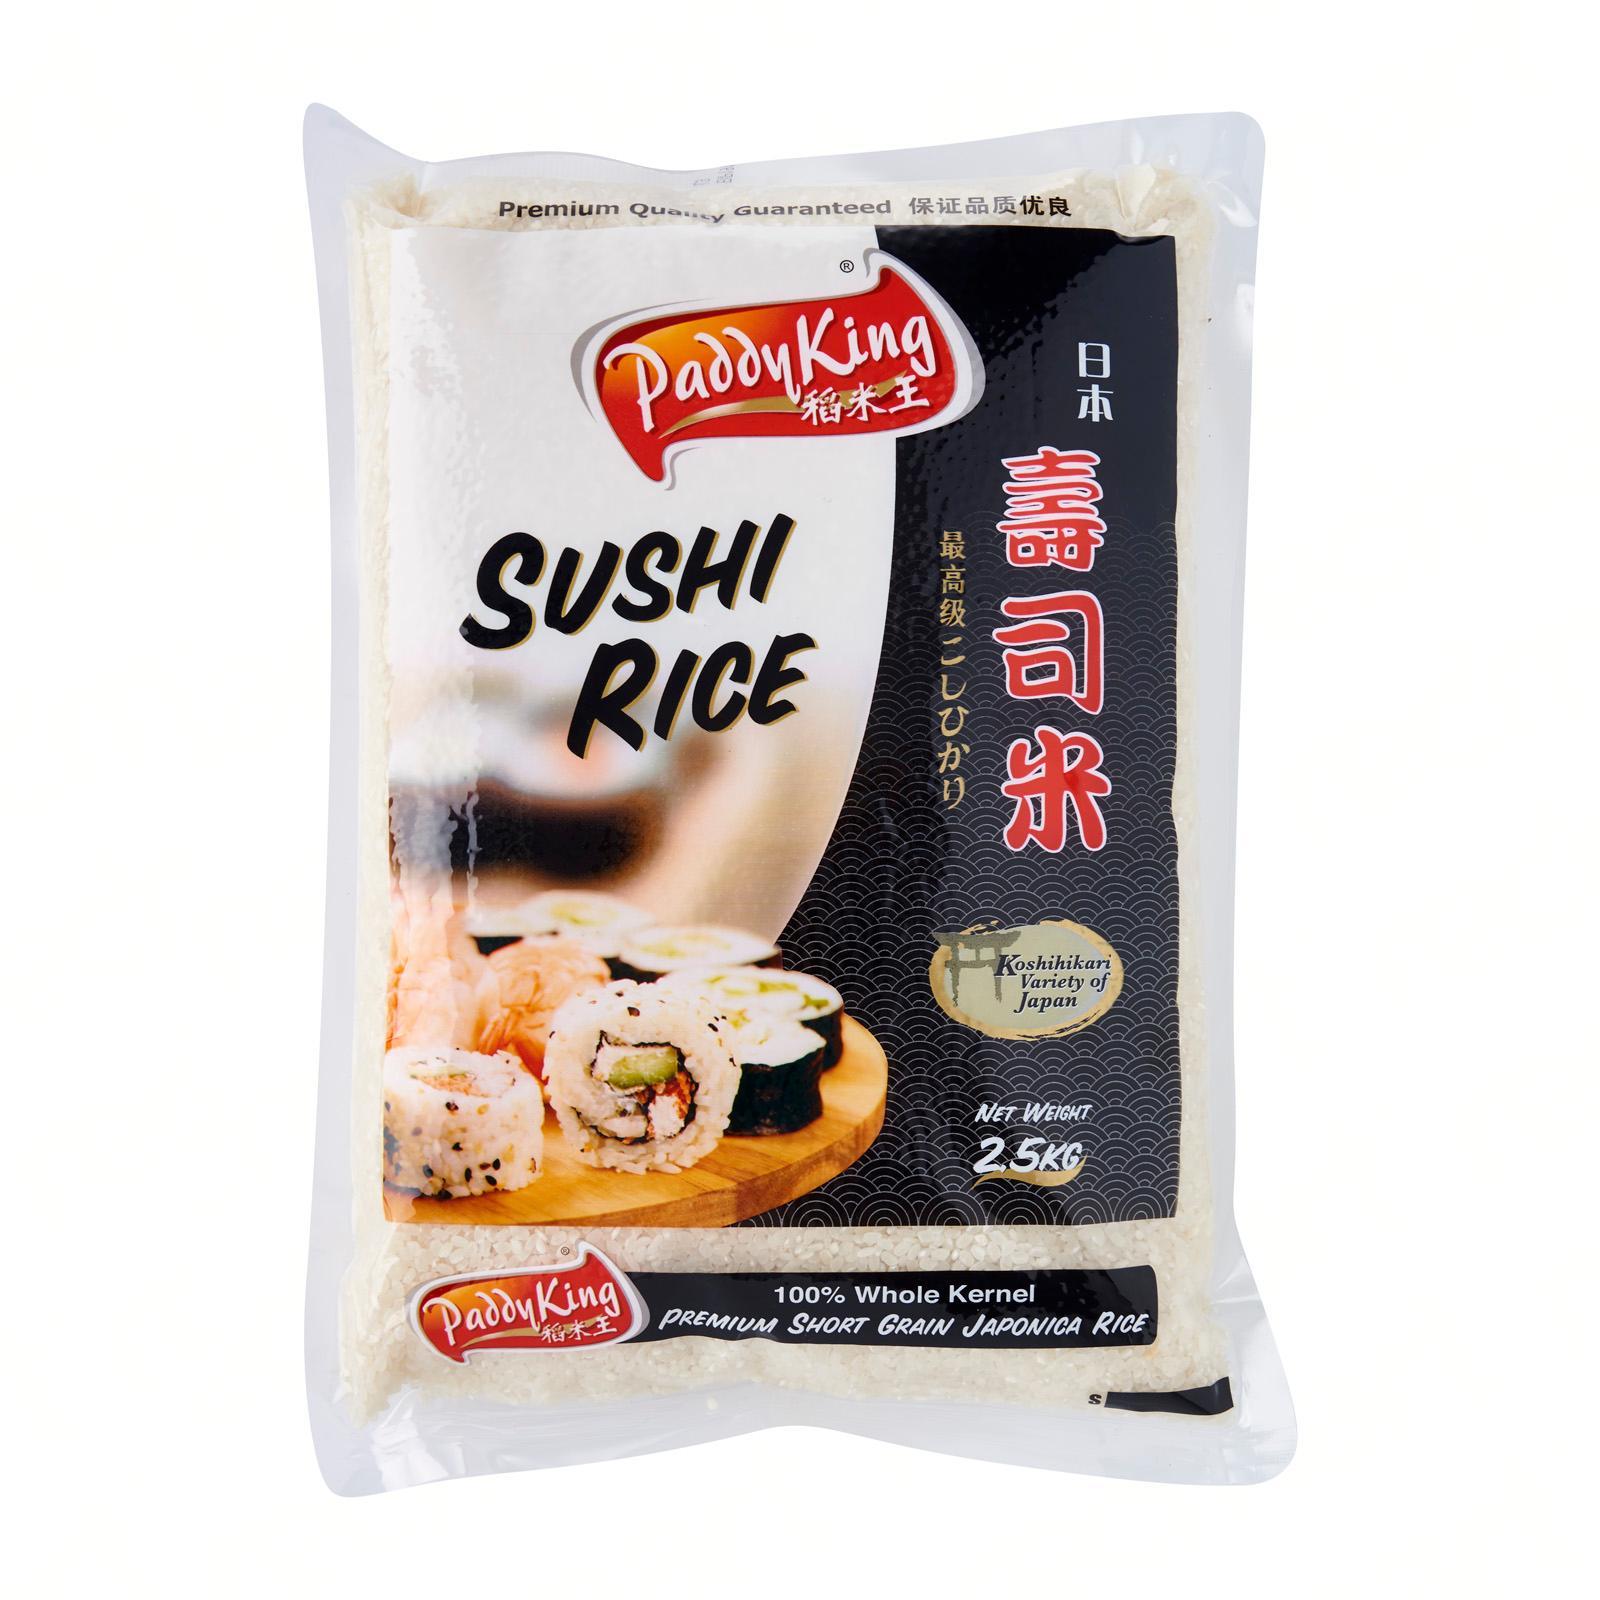 Paddyking USA Premium Sushi Rice